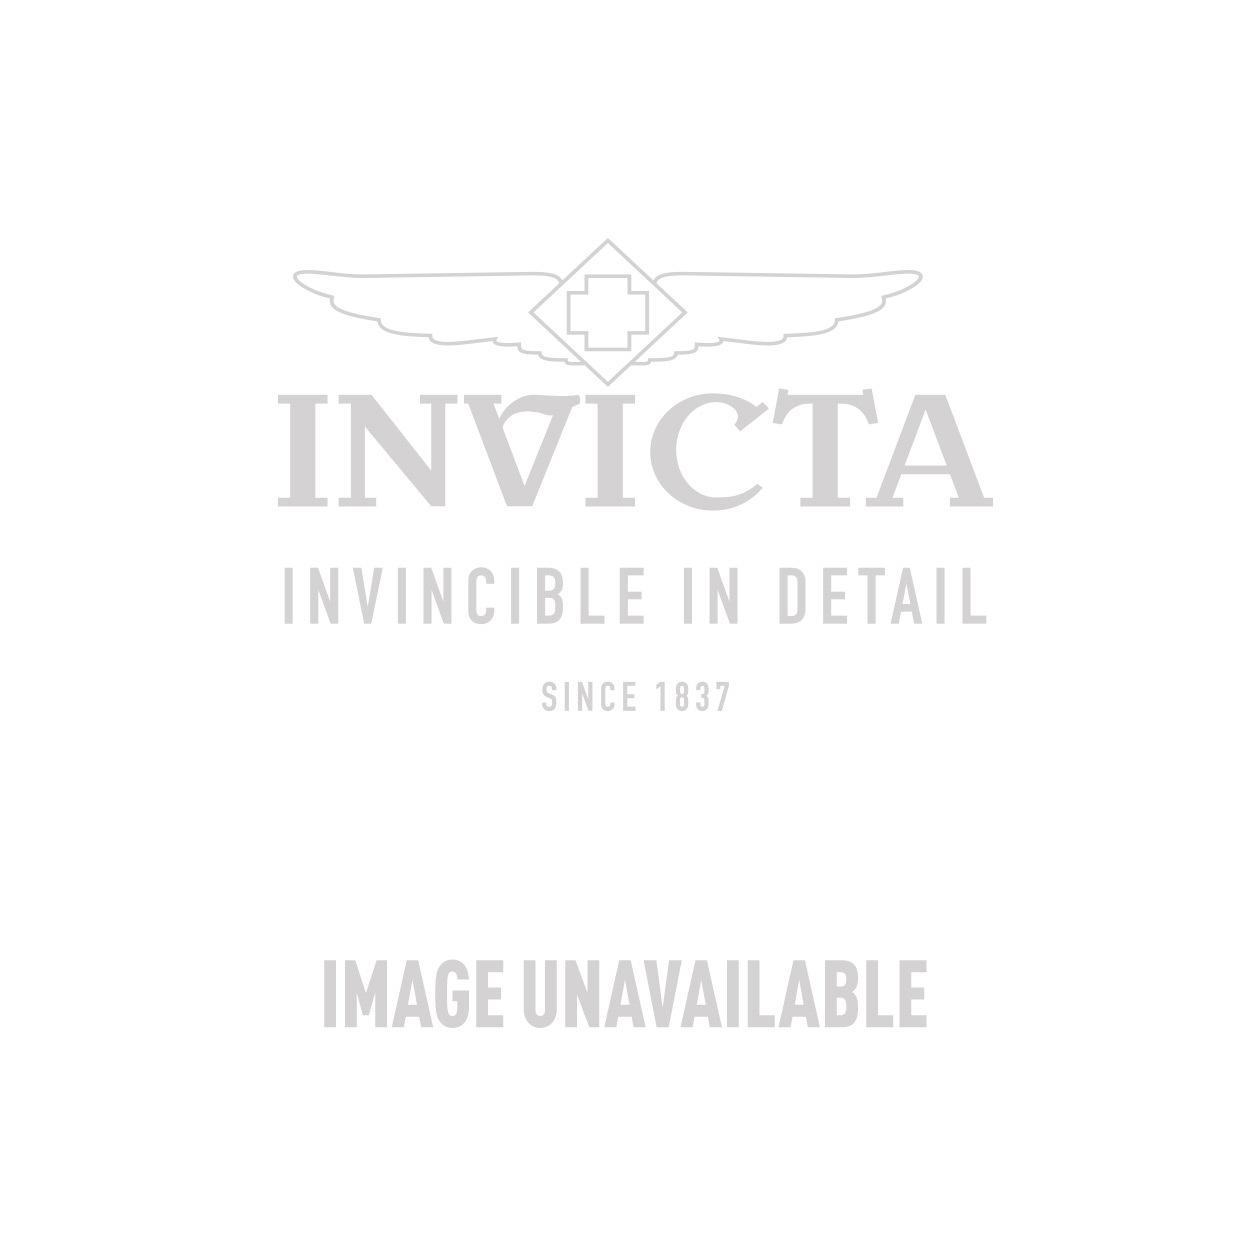 Invicta Corduba Swiss Movement Quartz Watch - Black case with Black, Yellow tone Stainless Steel, Polyurethane band - Model 6681